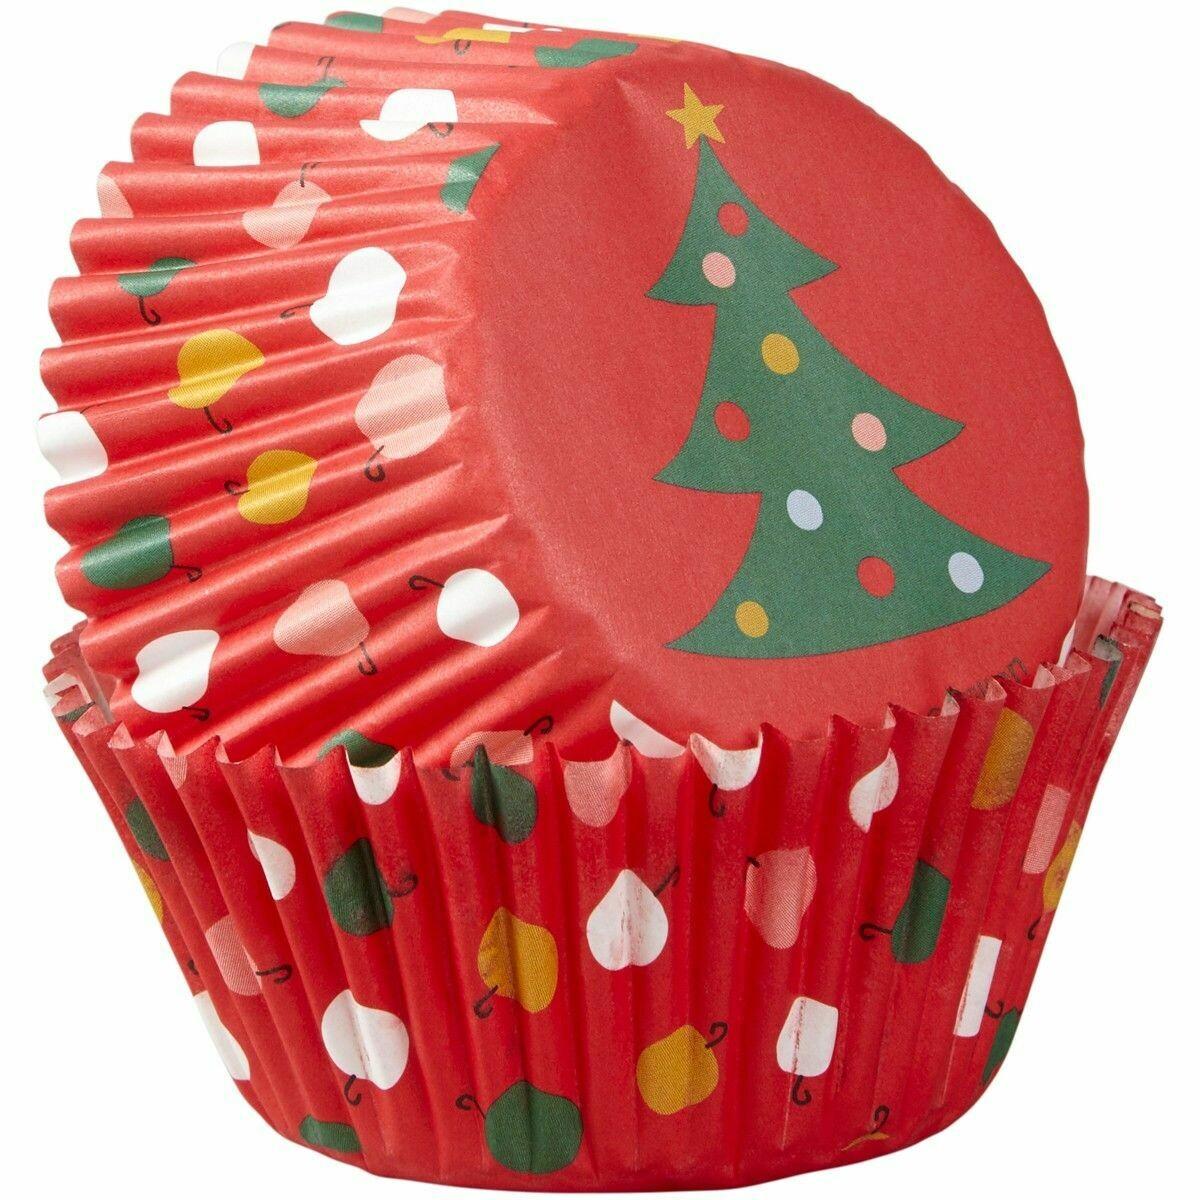 Wilton Christmas Cupcake Cases -TREE & ORNAMENTS -Θήκες ψησίματος Καπκέικ/Μάφιν χριστουγεννιάτικες 75 τεμ